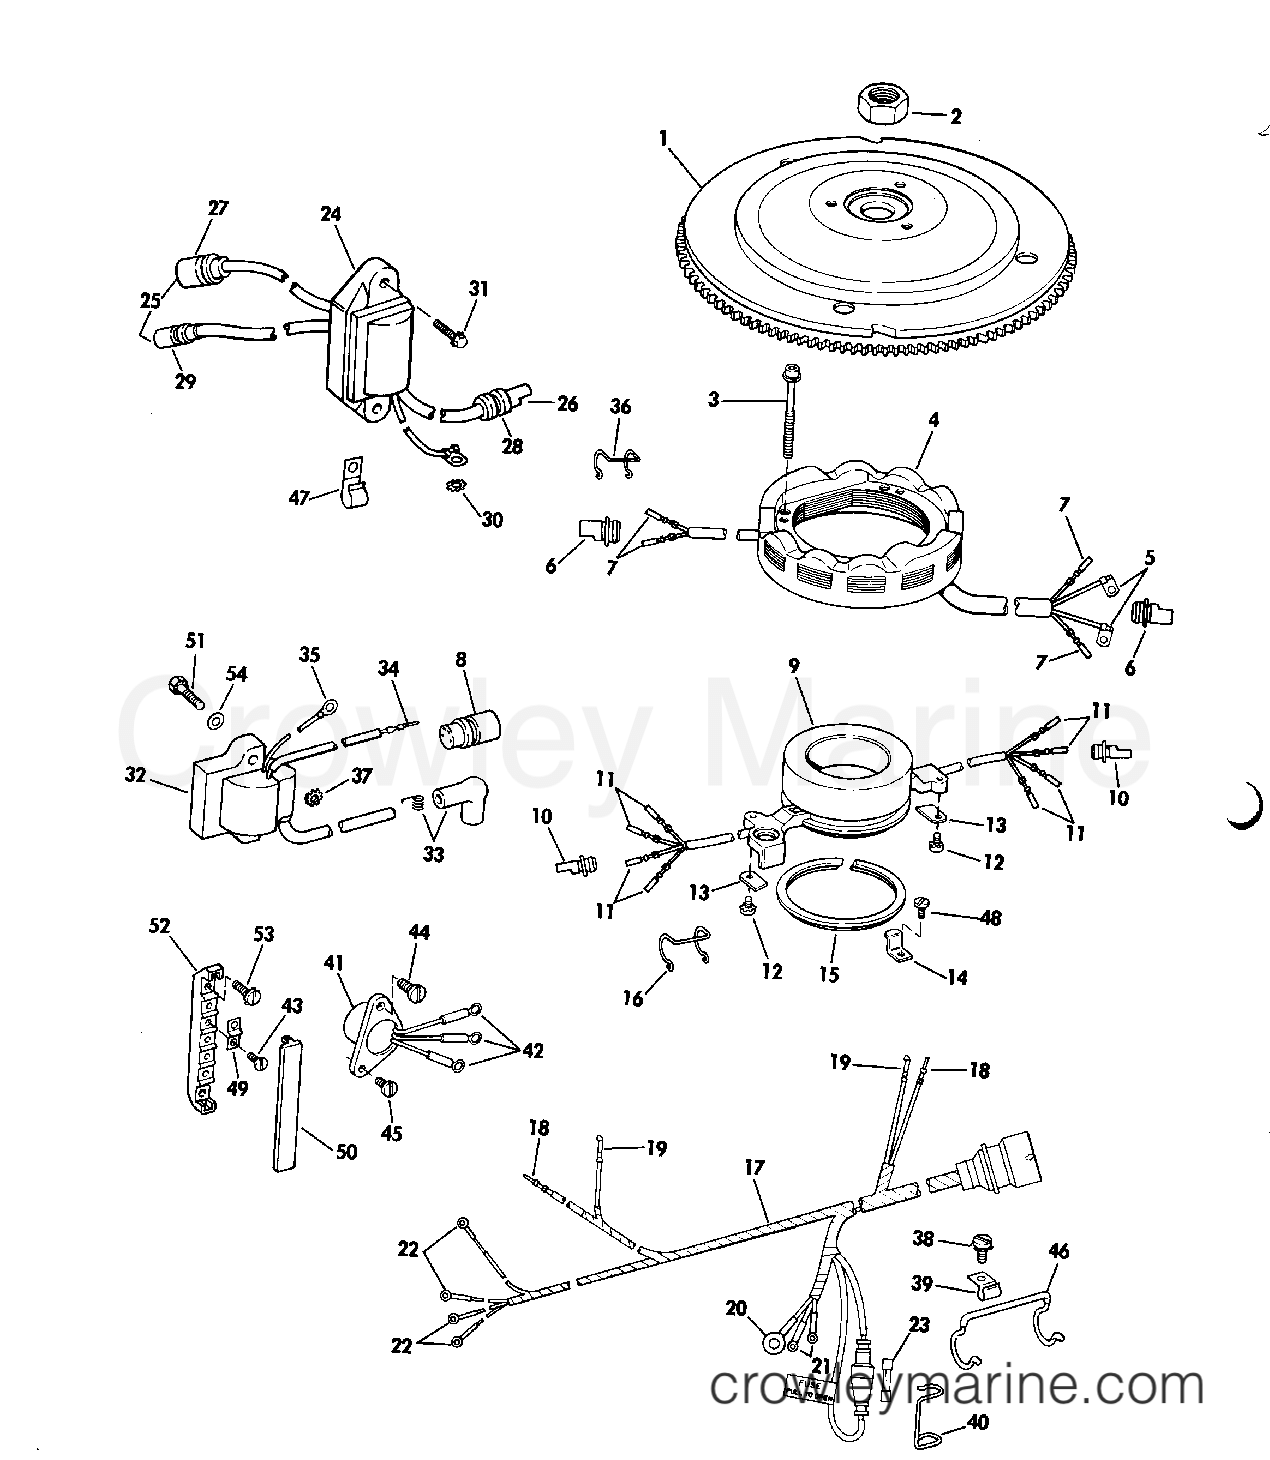 Wiring Diagram For K5 Blazer